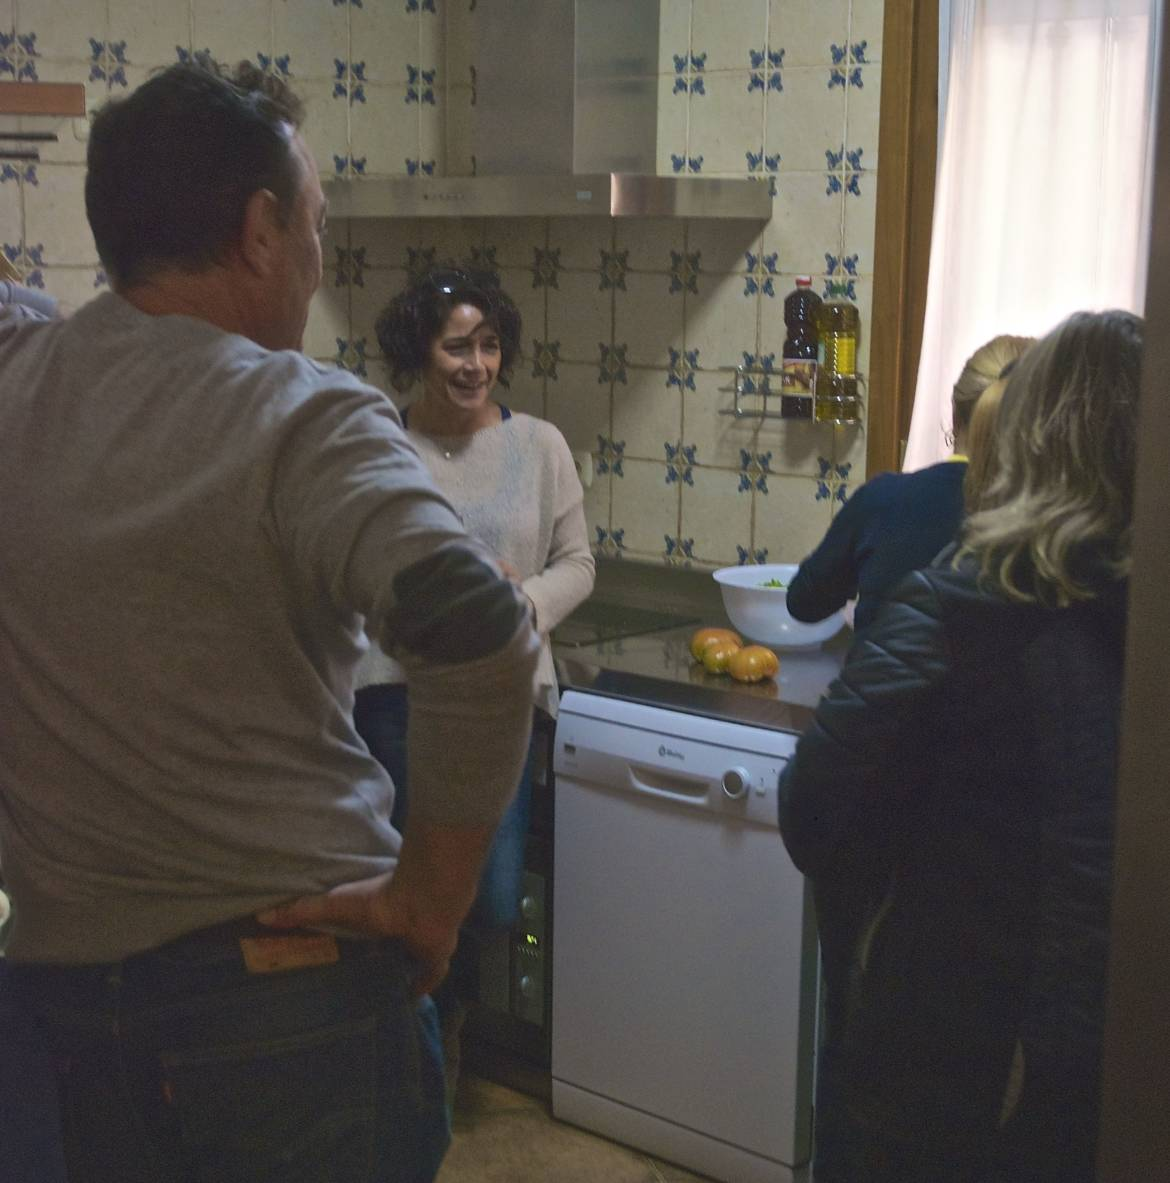 Alquiler-Casas-rurales-grandes-Navarra-Orbara-Etxea-Mendigorria-15.jpg